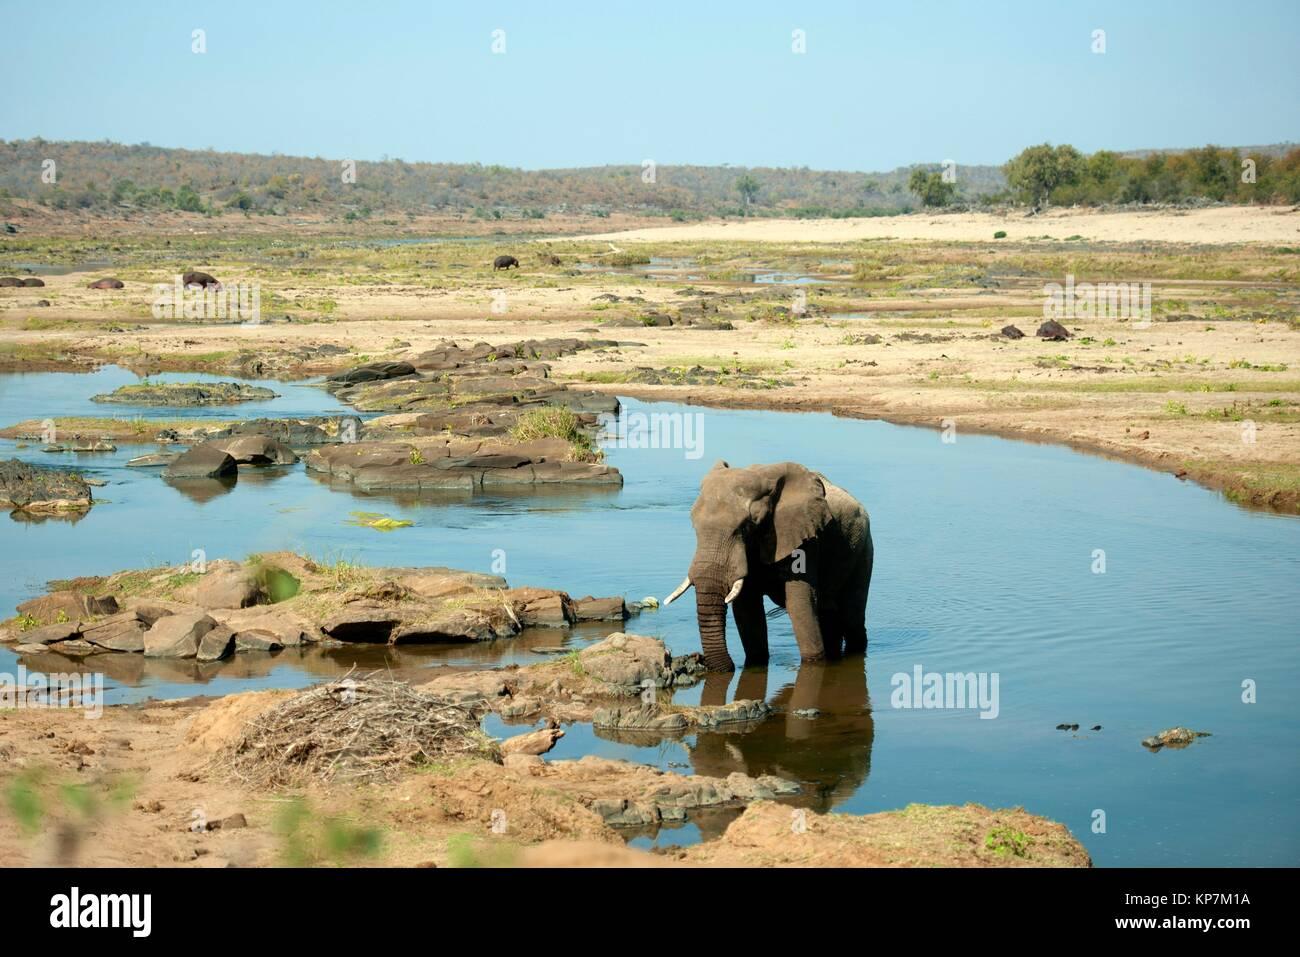 Elephant (Loxodonta africana) in river with Hippopotami (Hippopotamus amphibius) in background, Kruger National - Stock Image